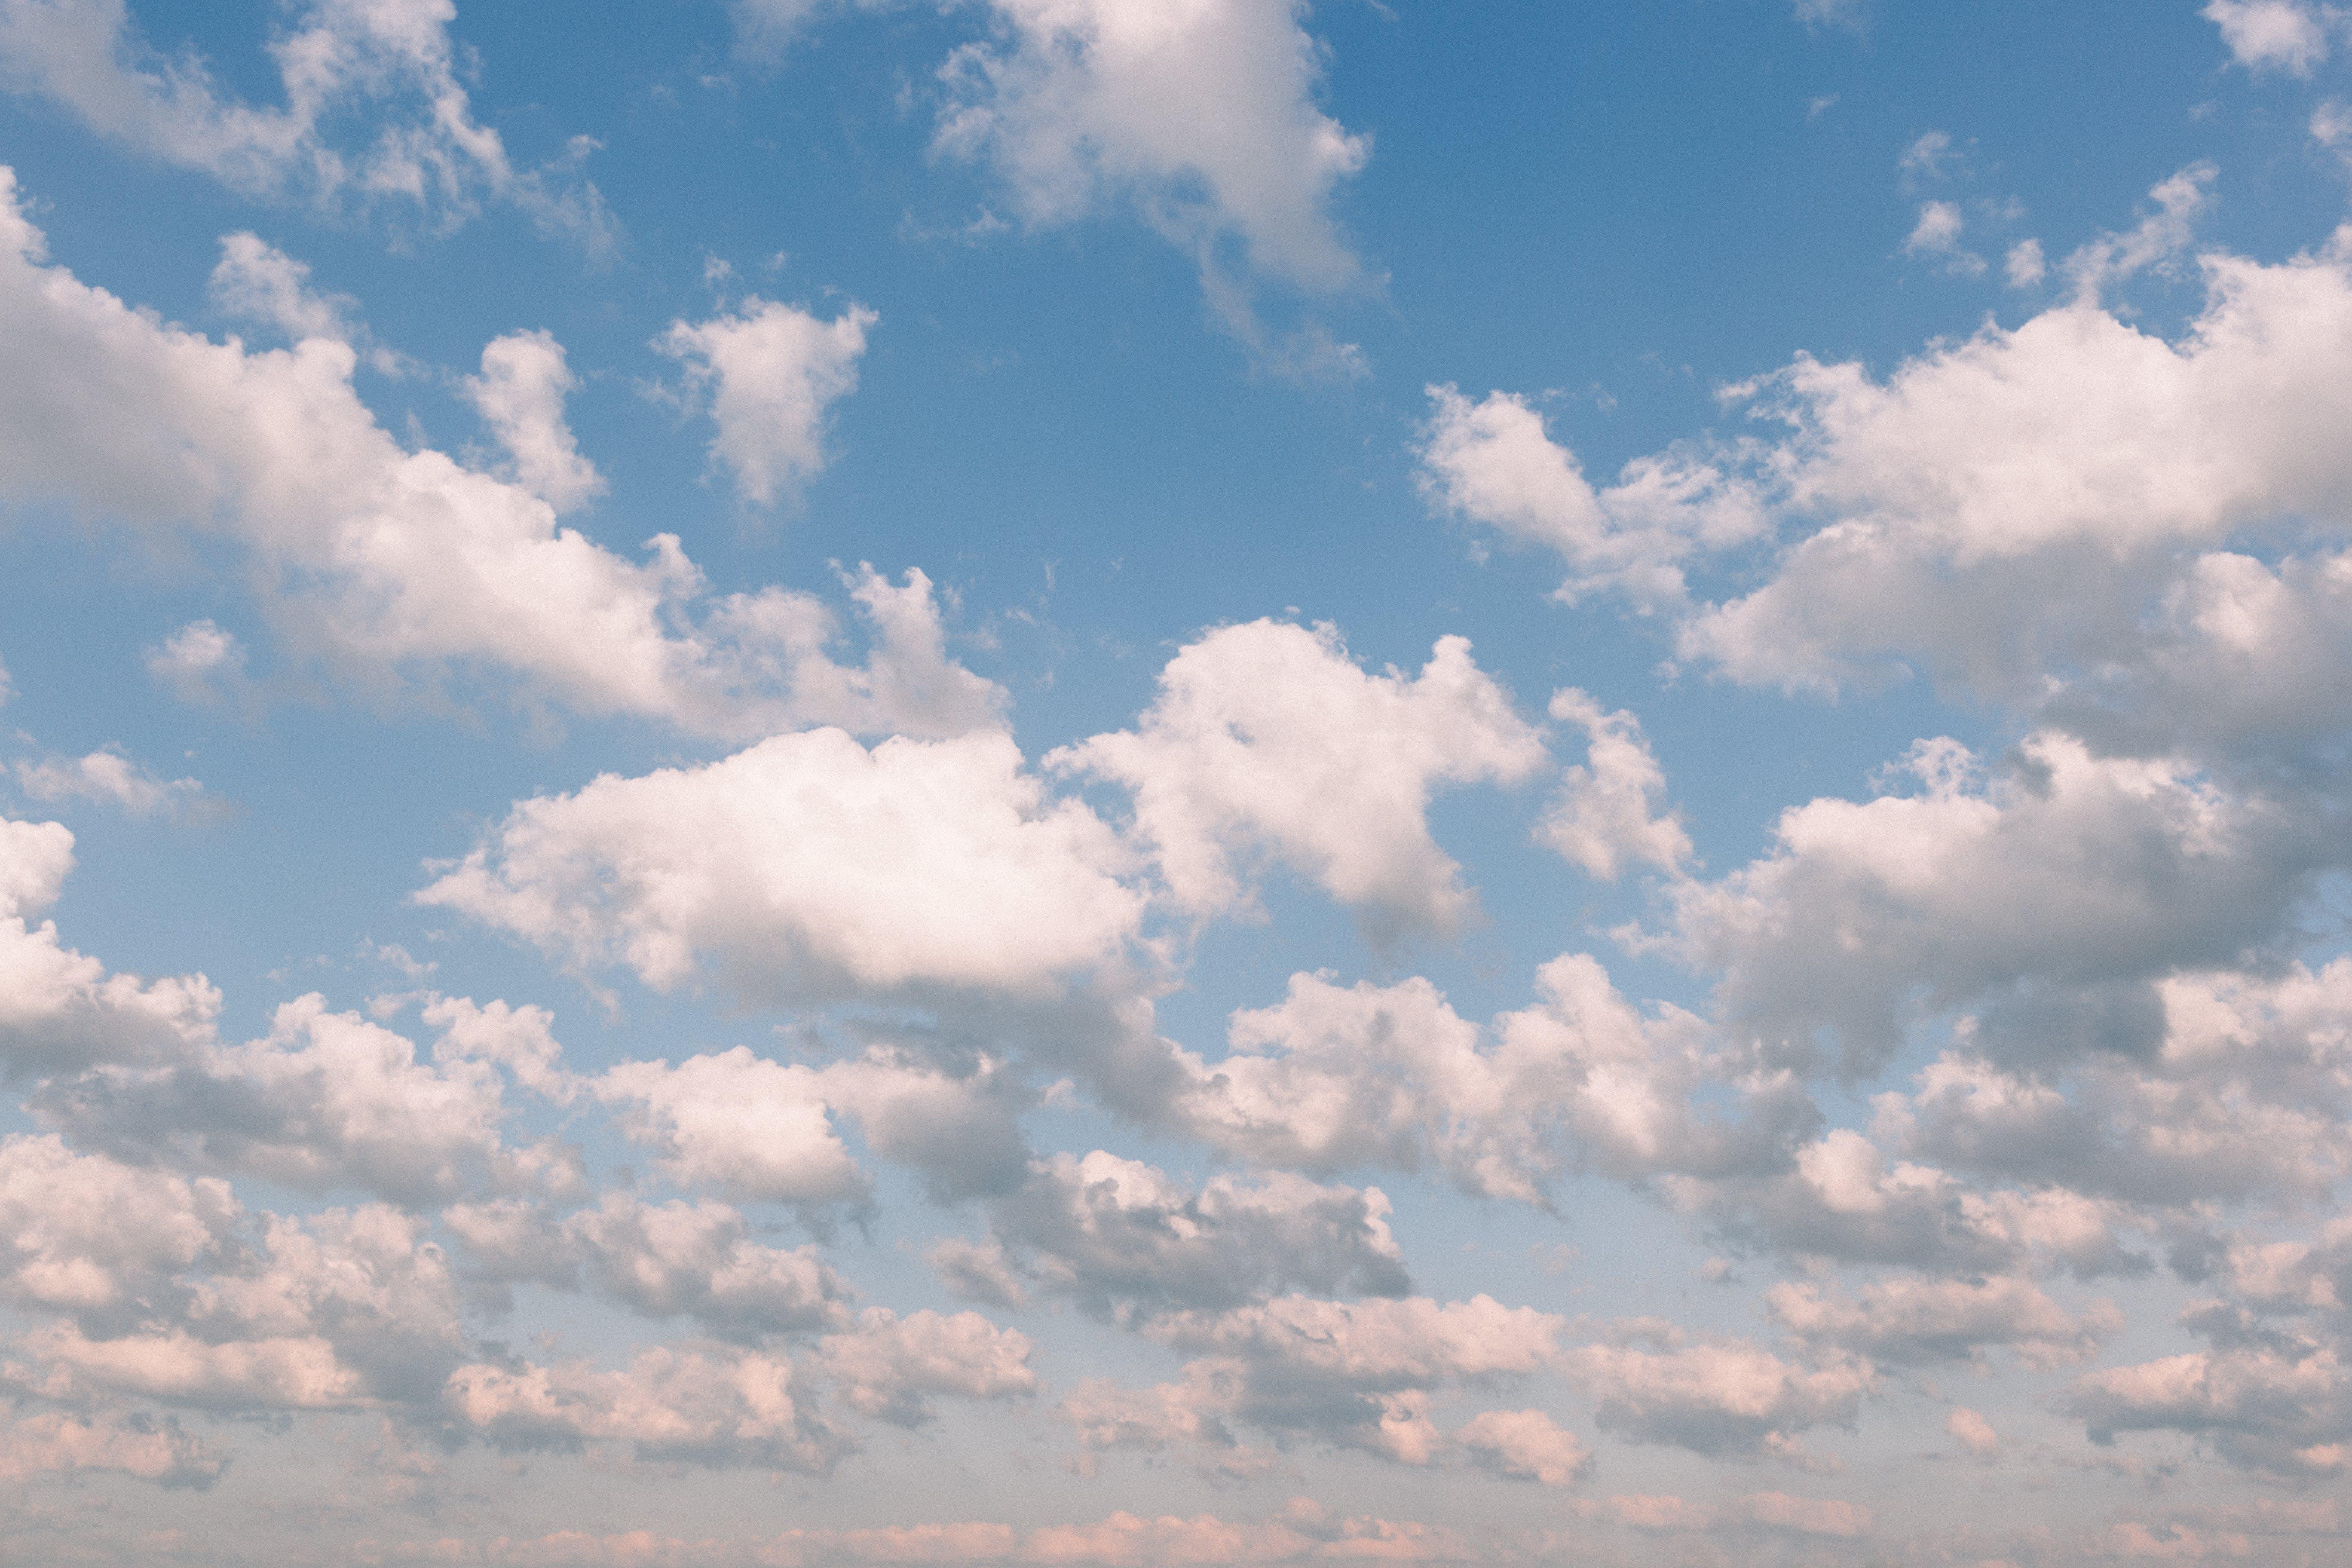 Kostenloses Stock Foto zu bewölkt, blauer himmel, himmel, natur